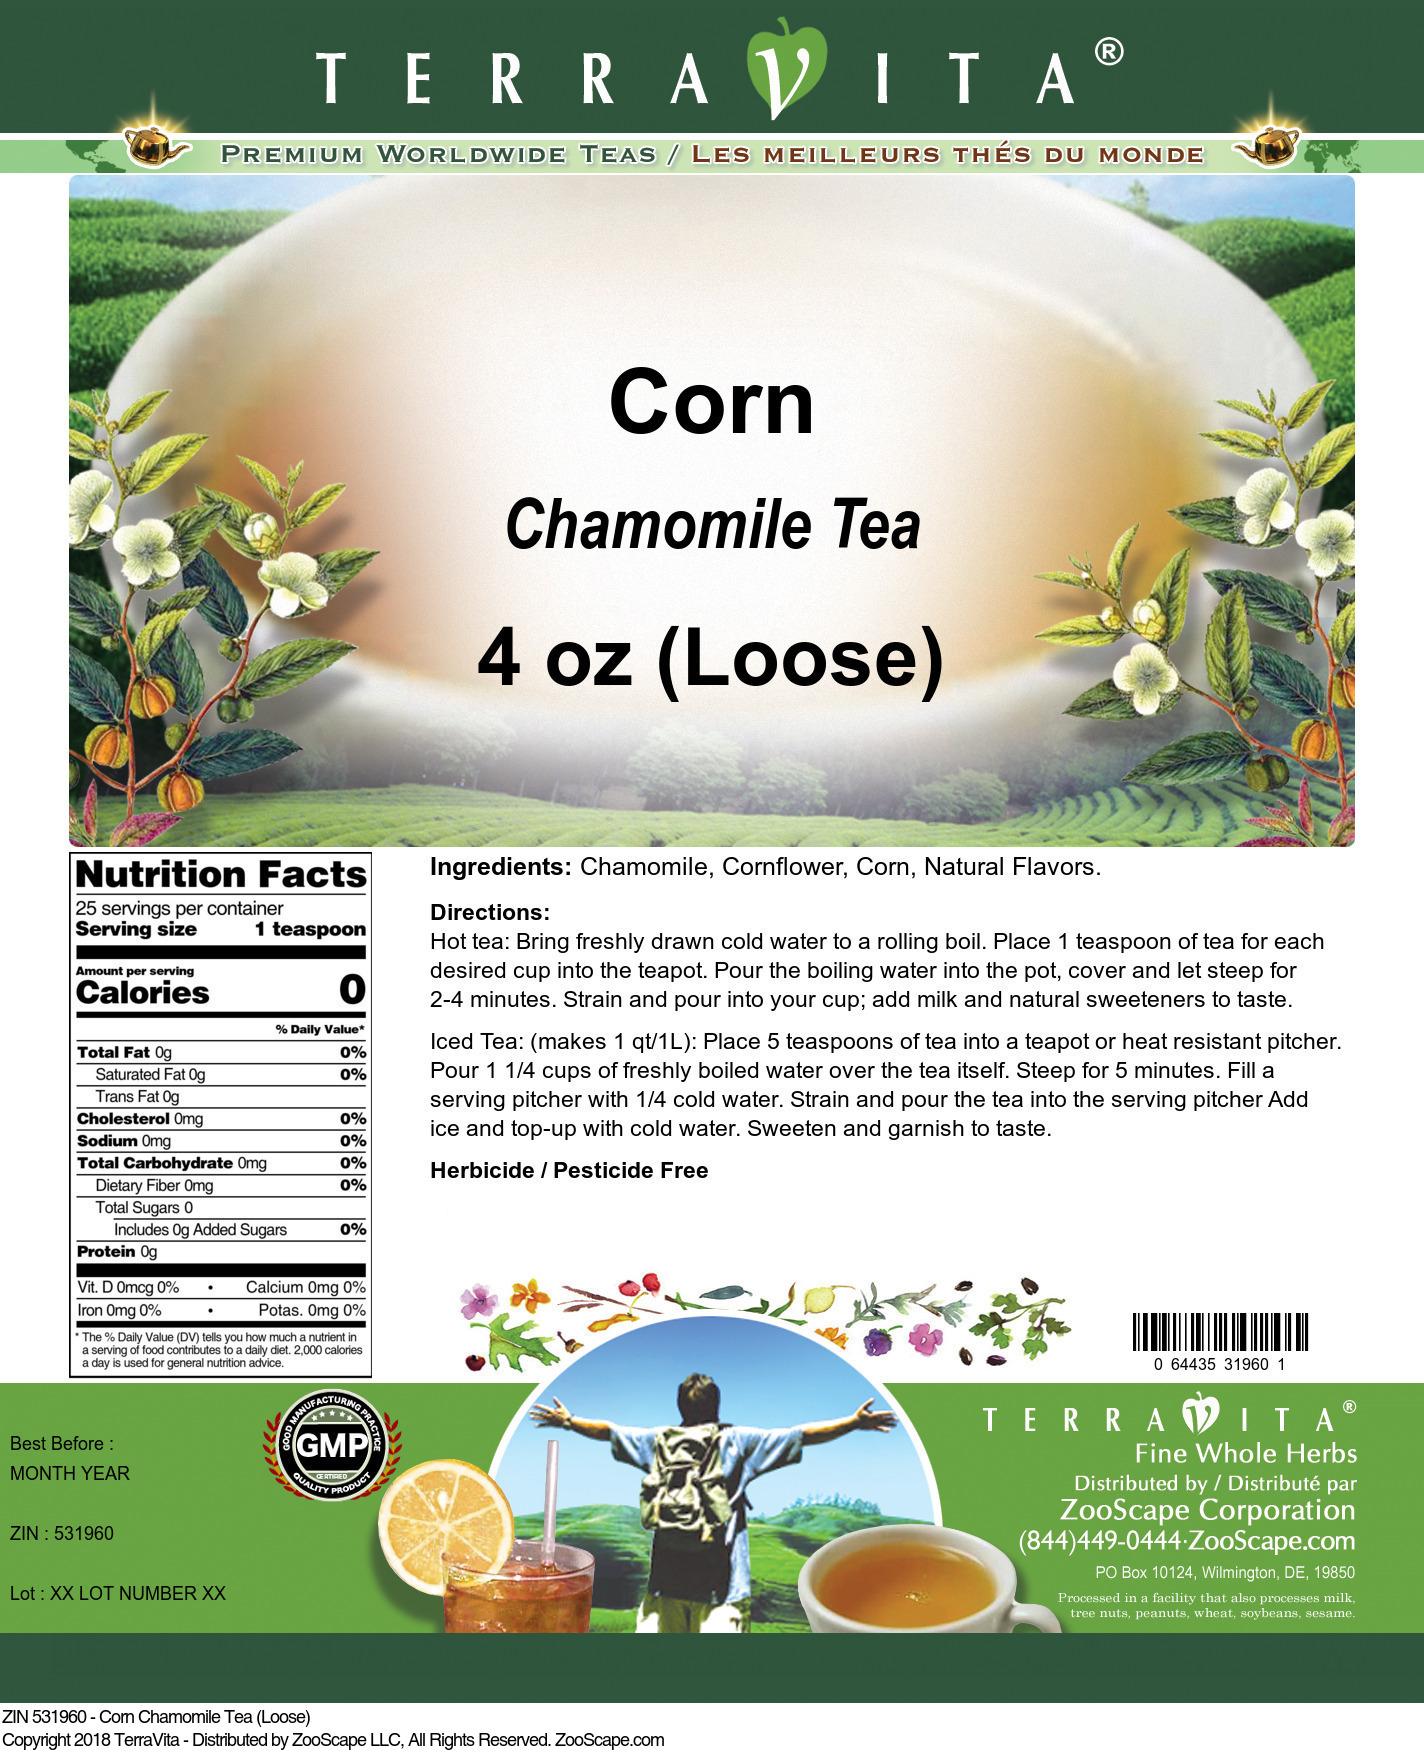 Corn Chamomile Tea (Loose)